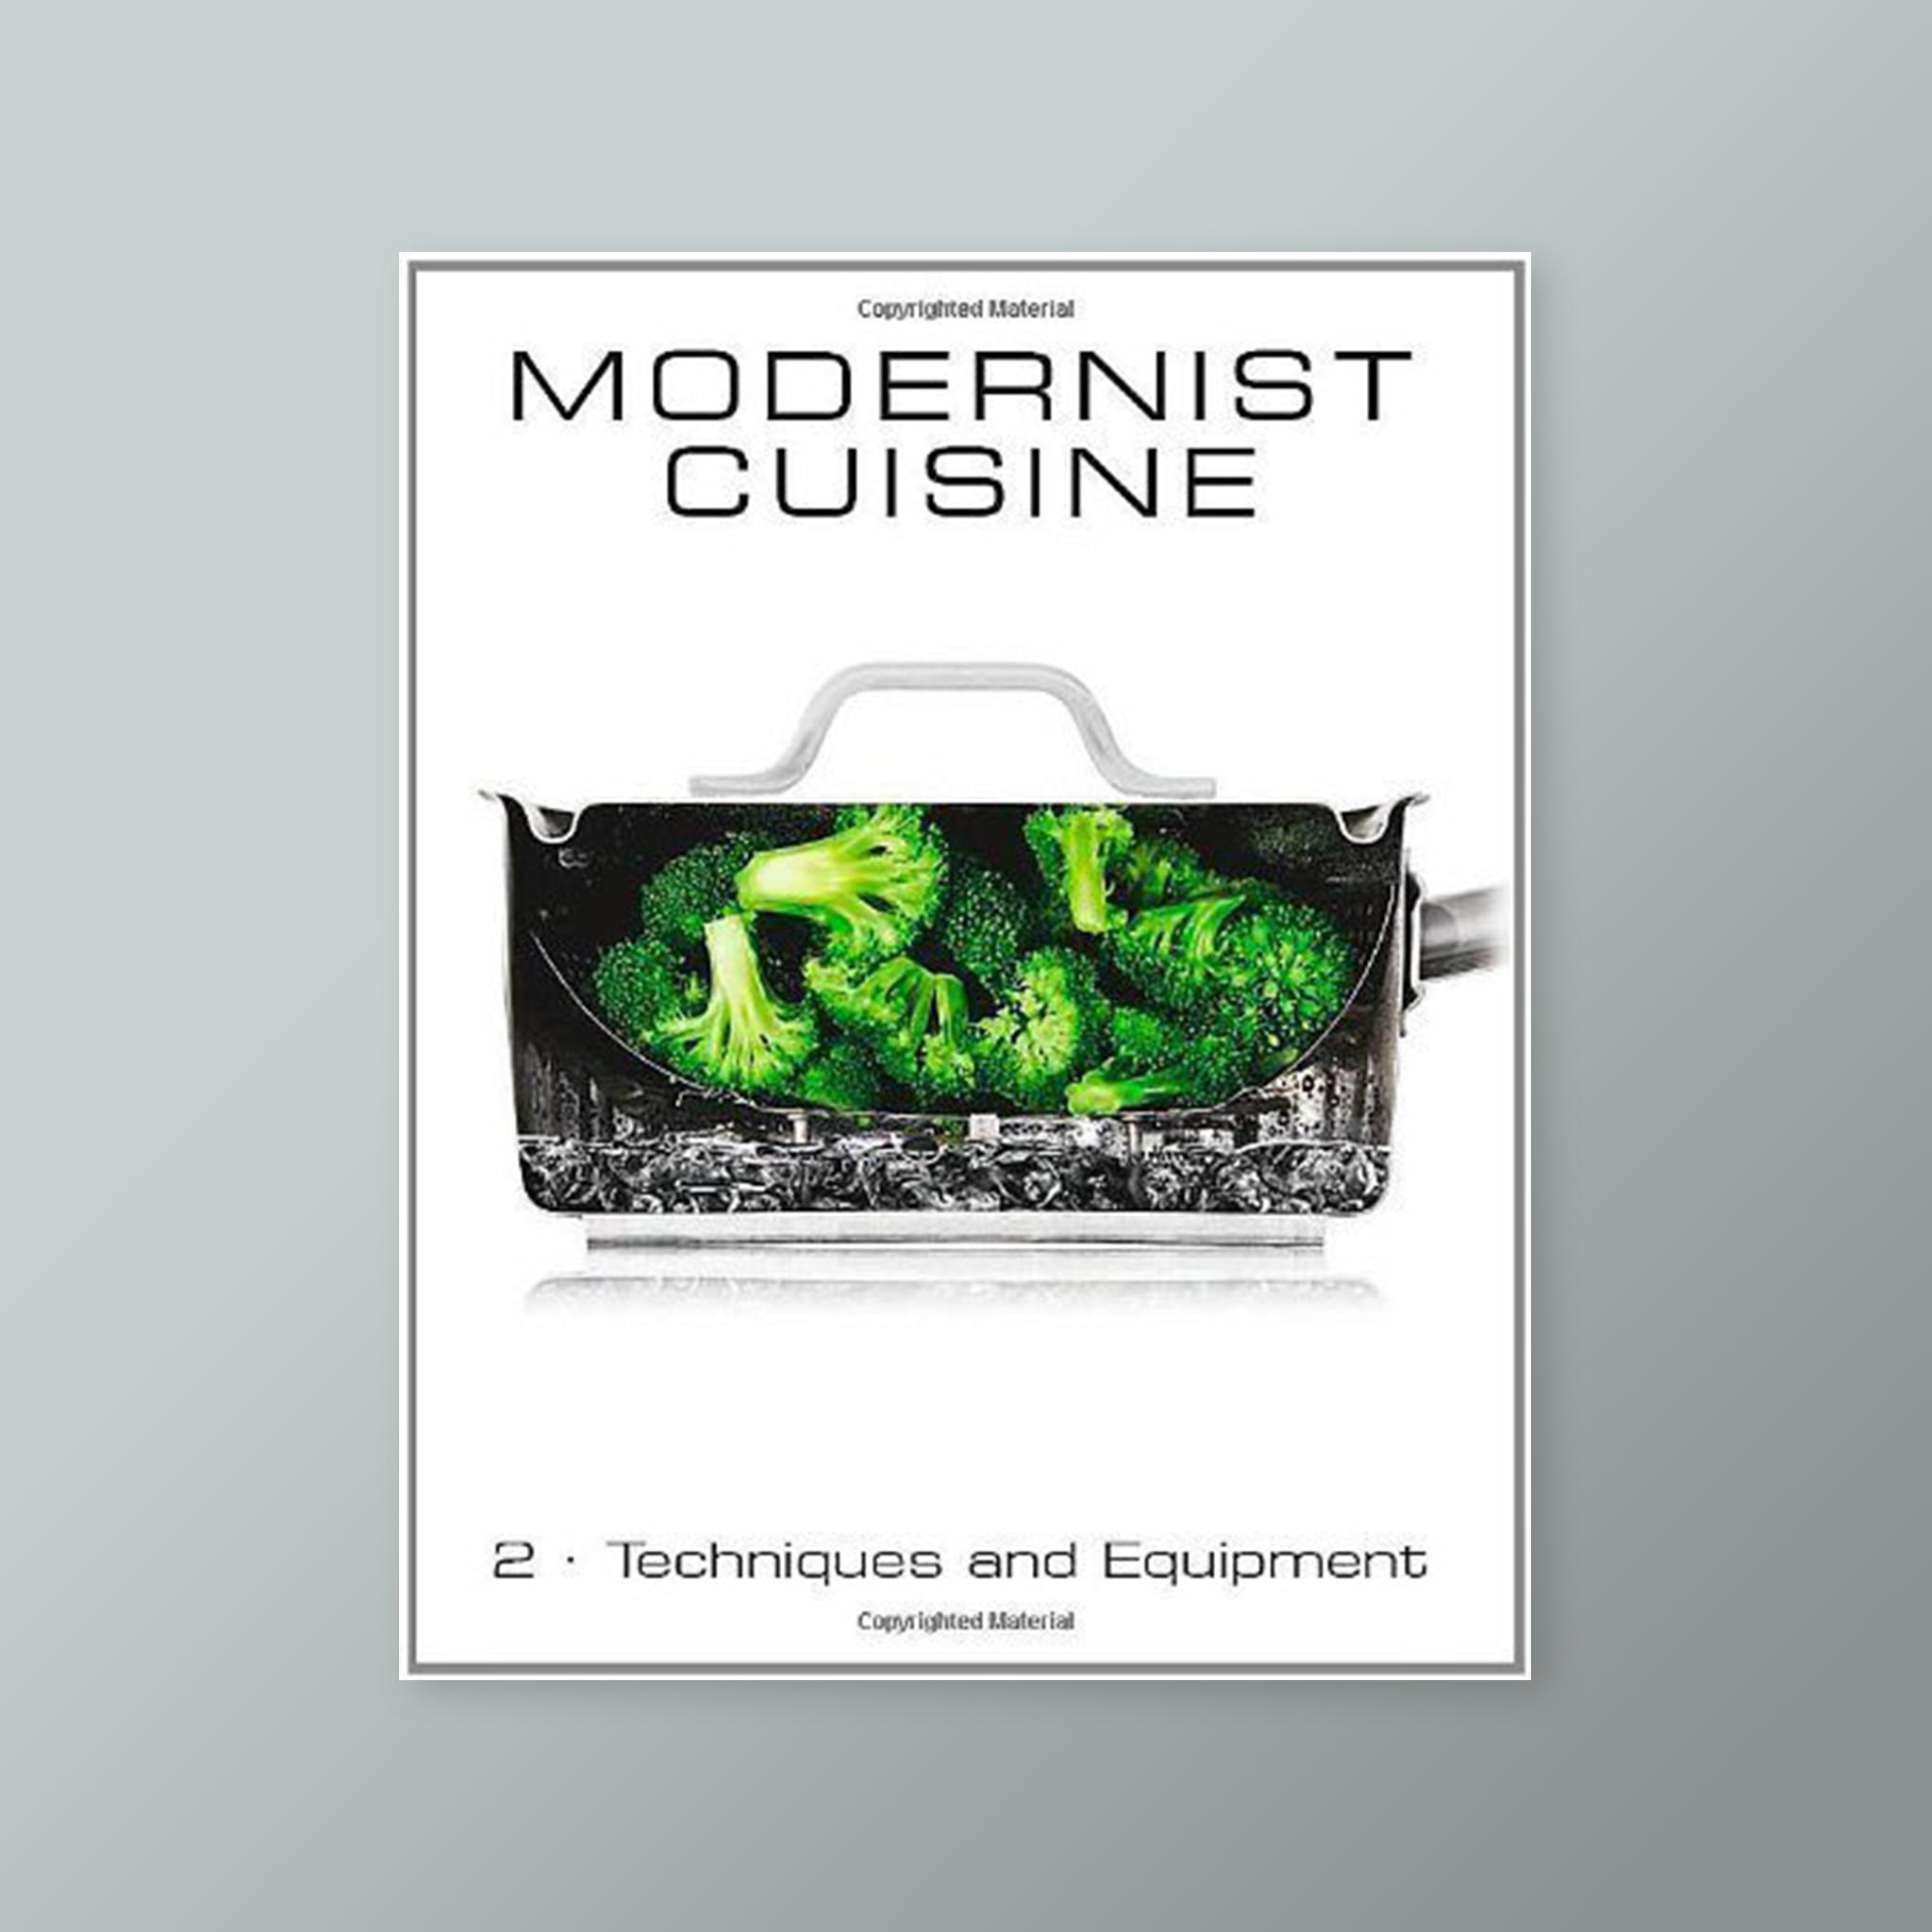 Modernist Cuisine.png